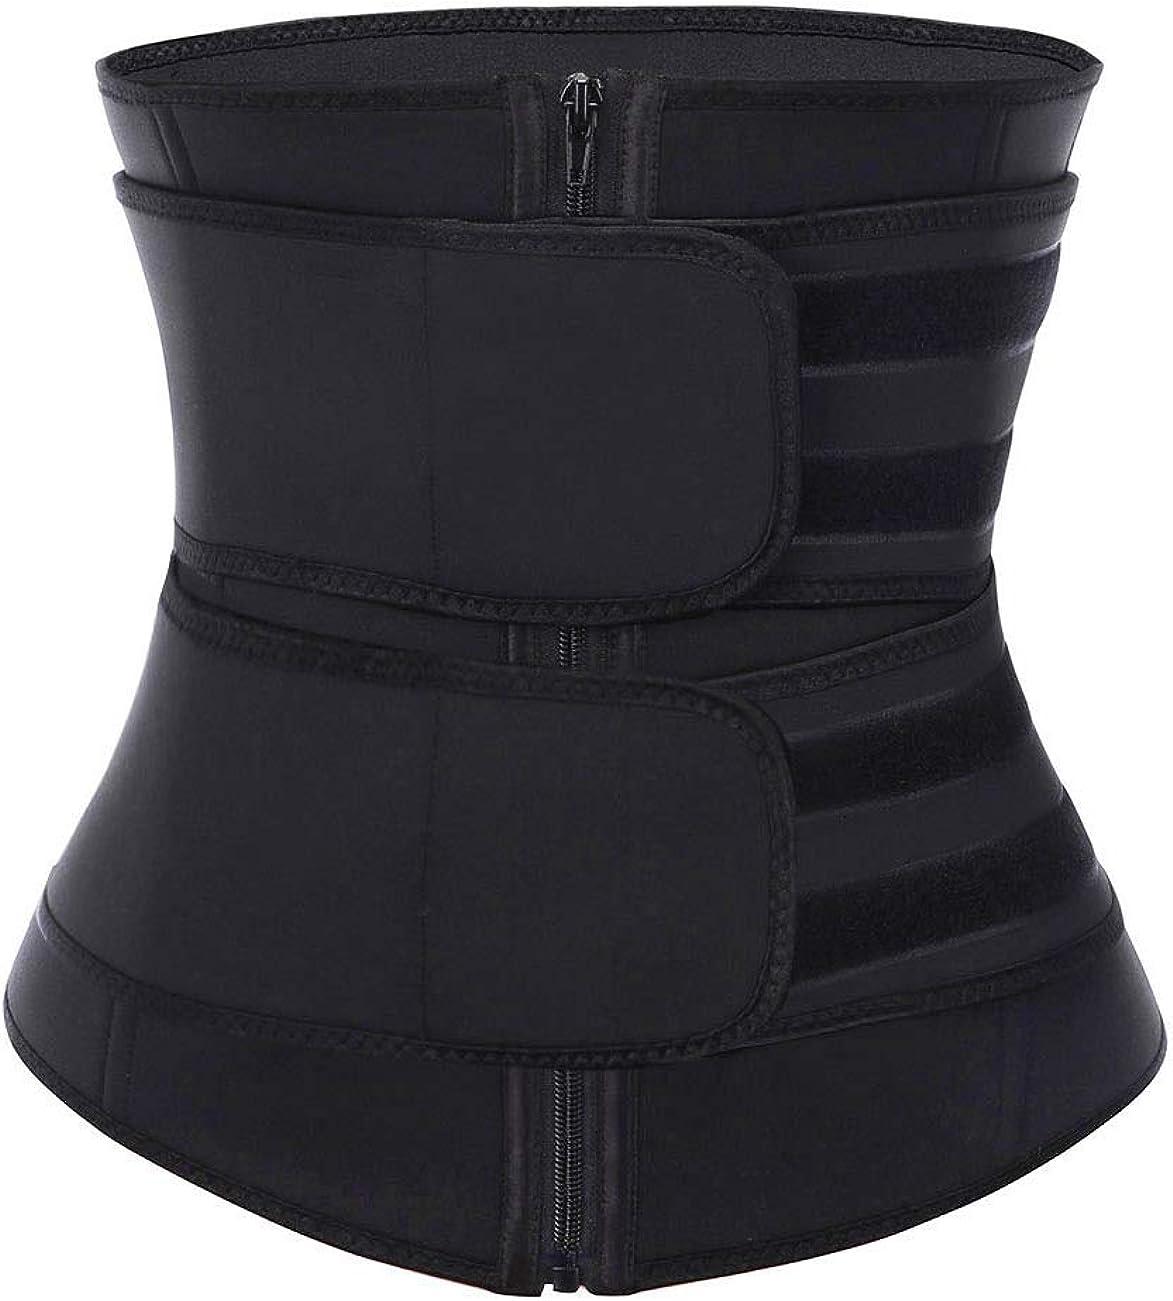 FEDNON Women Firm Control Waist Trainer Cincher Girdle Latex Workout Steel Boned Body Shaper